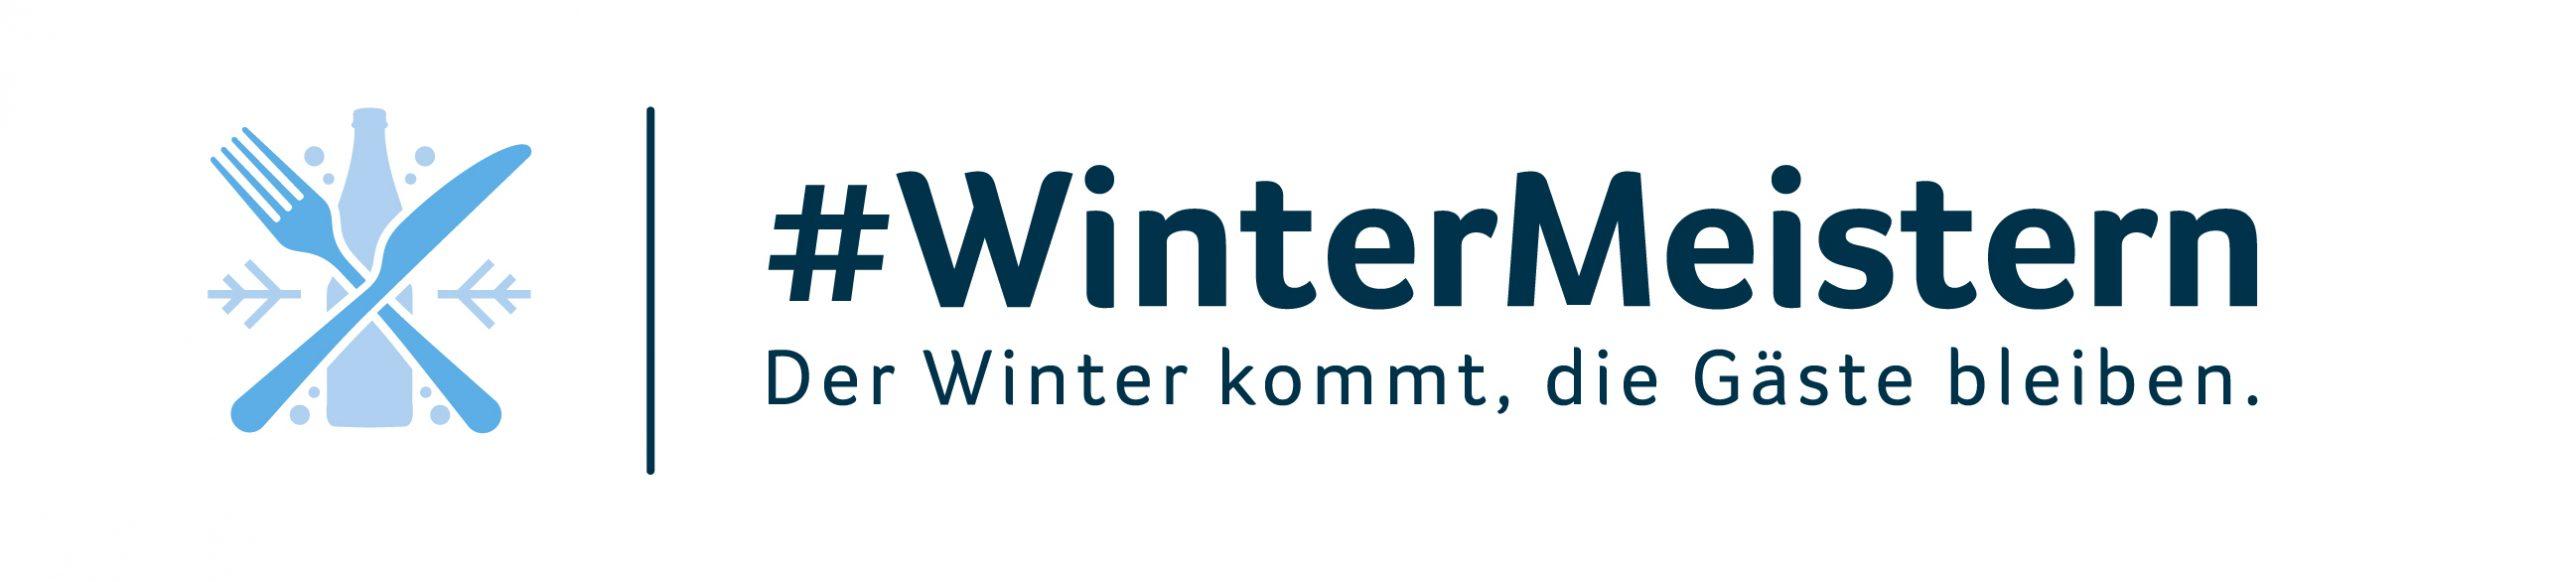 wintermeistern